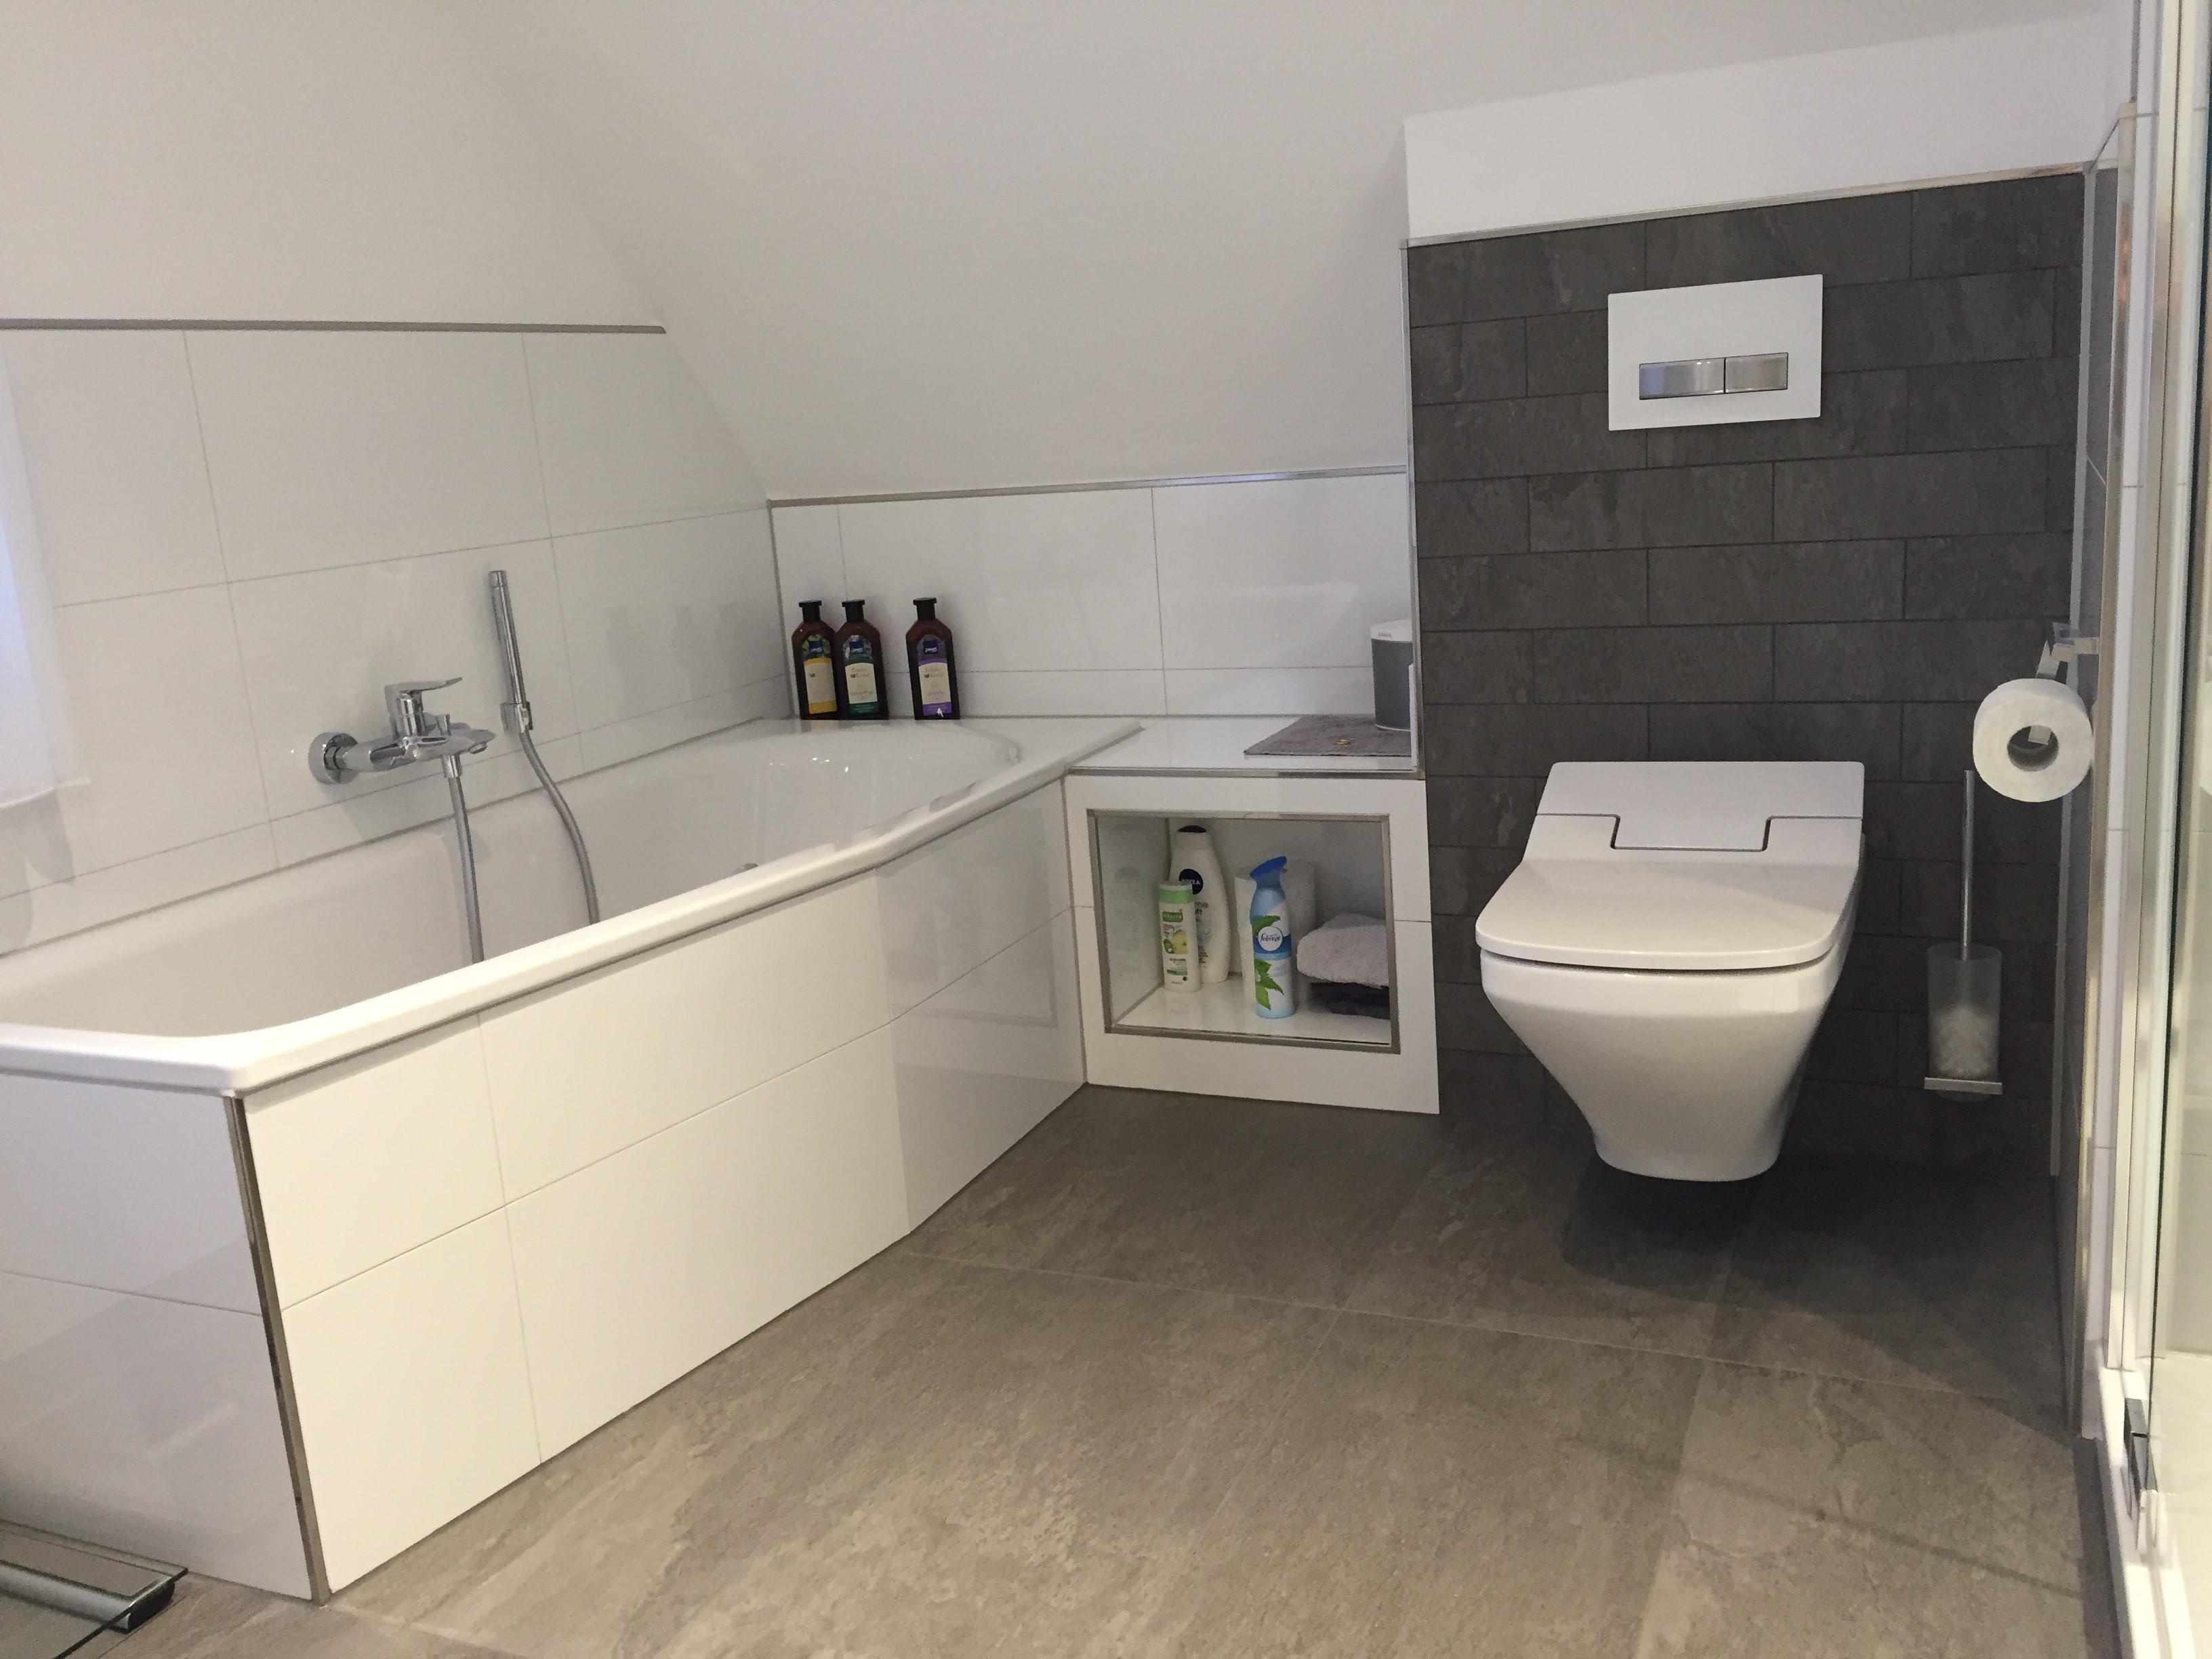 Komplettsanierung badezimmer im obergeschoss mit dachschr ge for Bad komplettsanierung